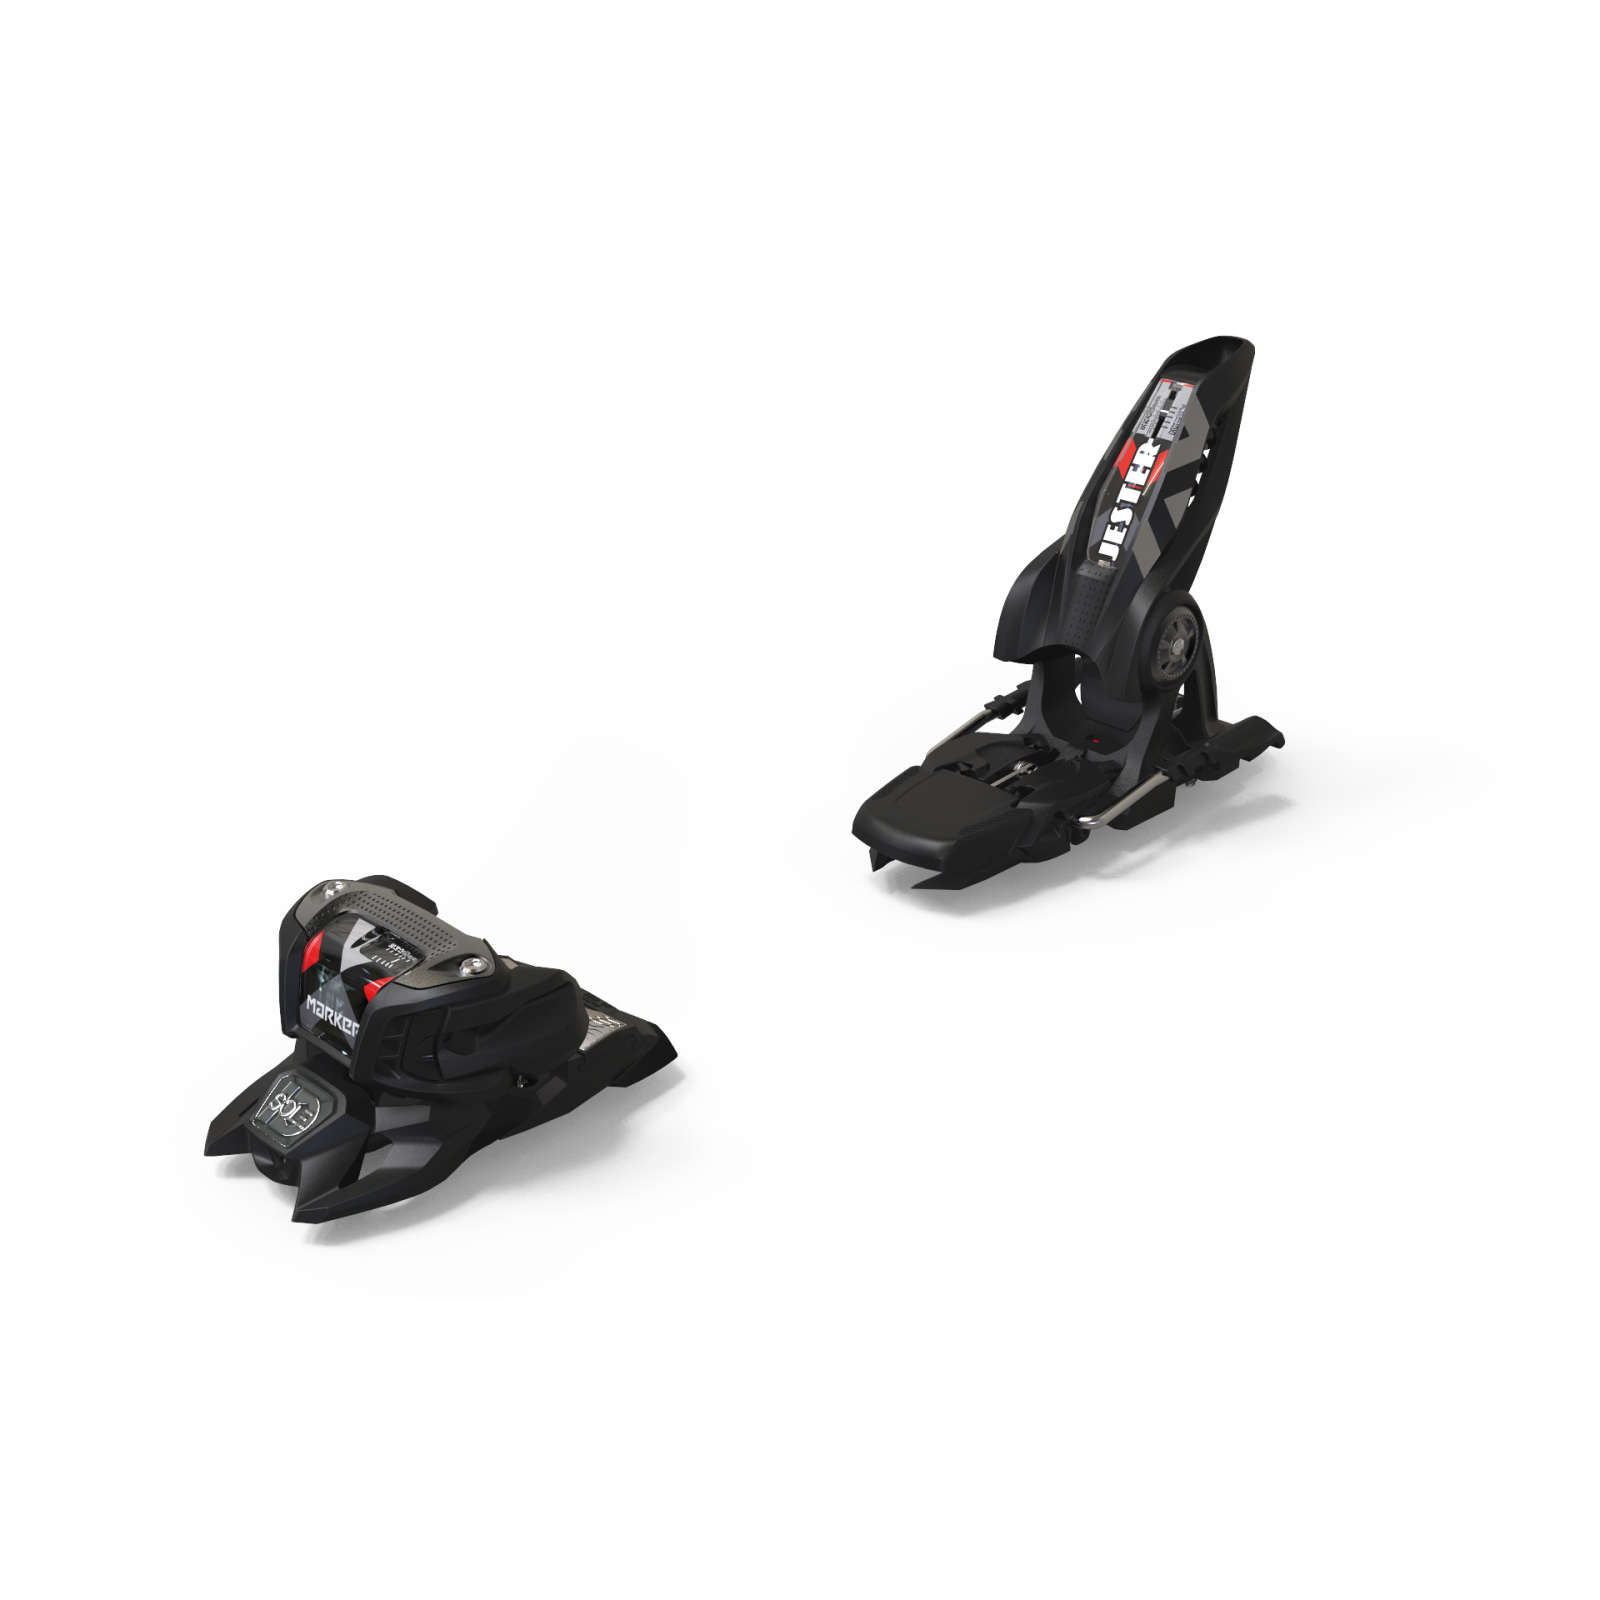 2020 Marker Jester 16 Ski Binding